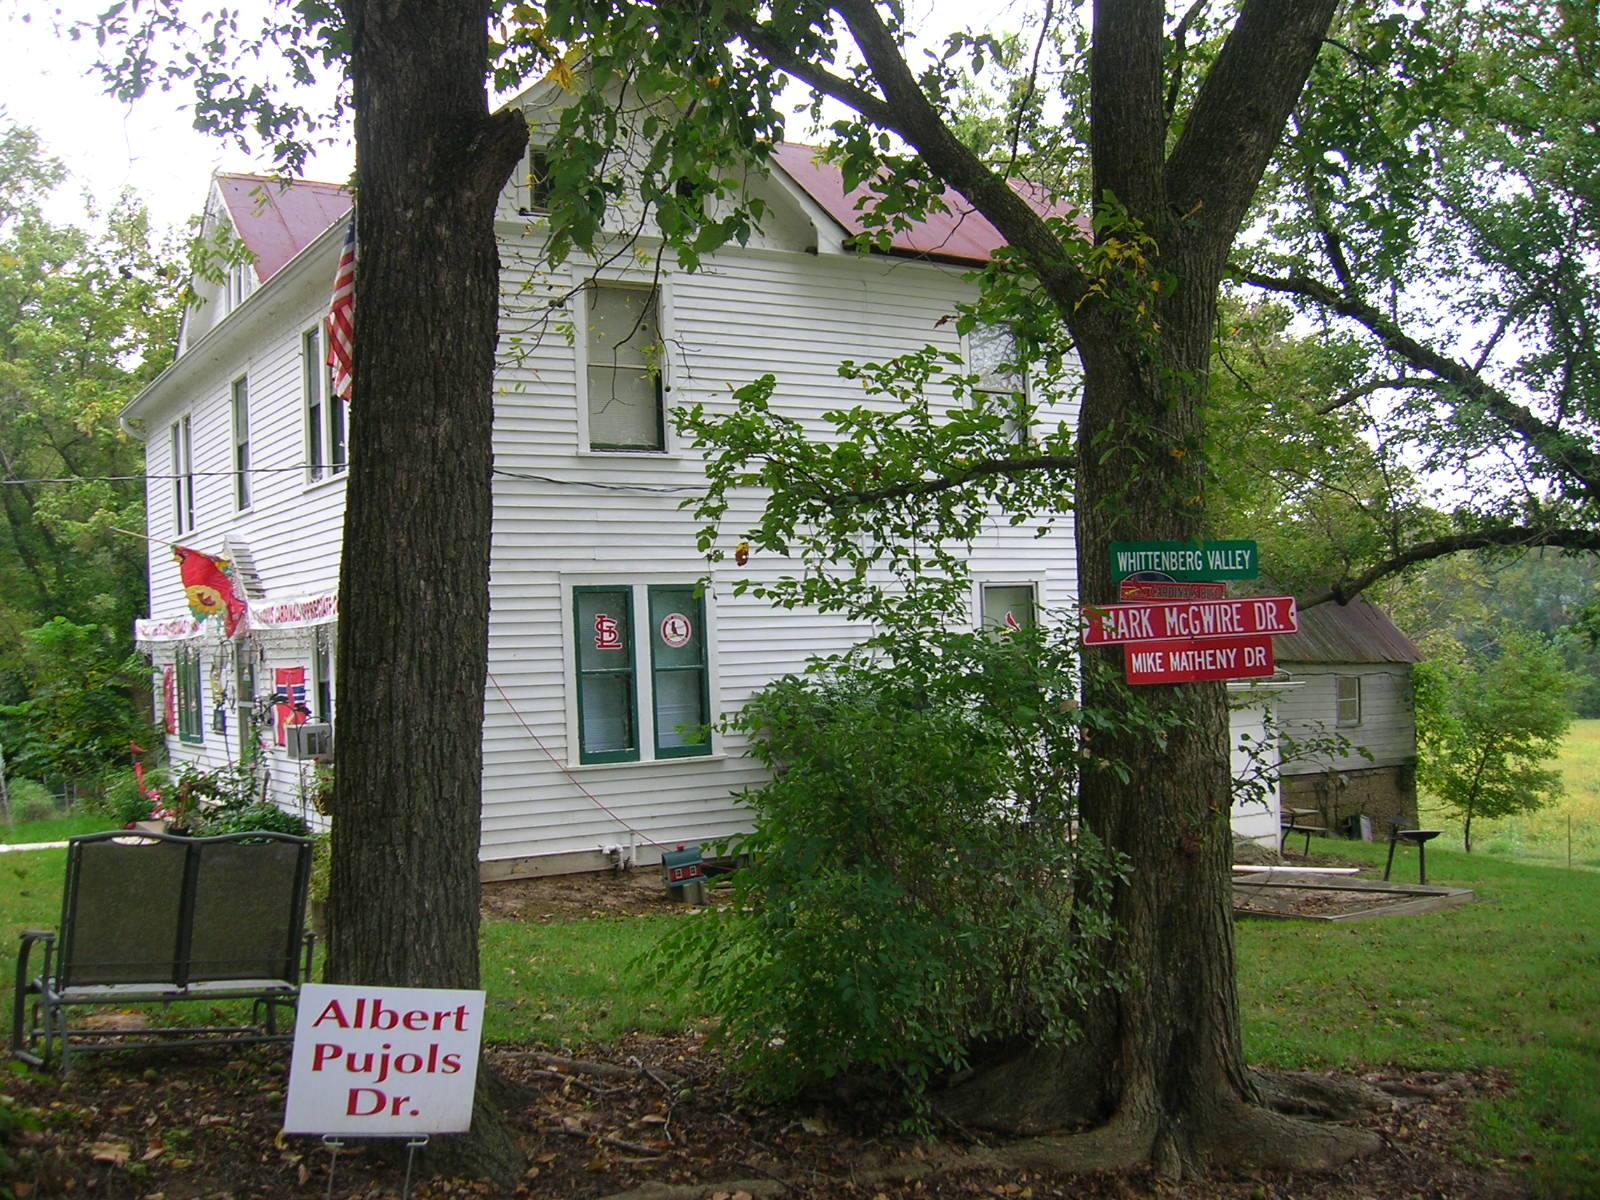 Albert pujols house